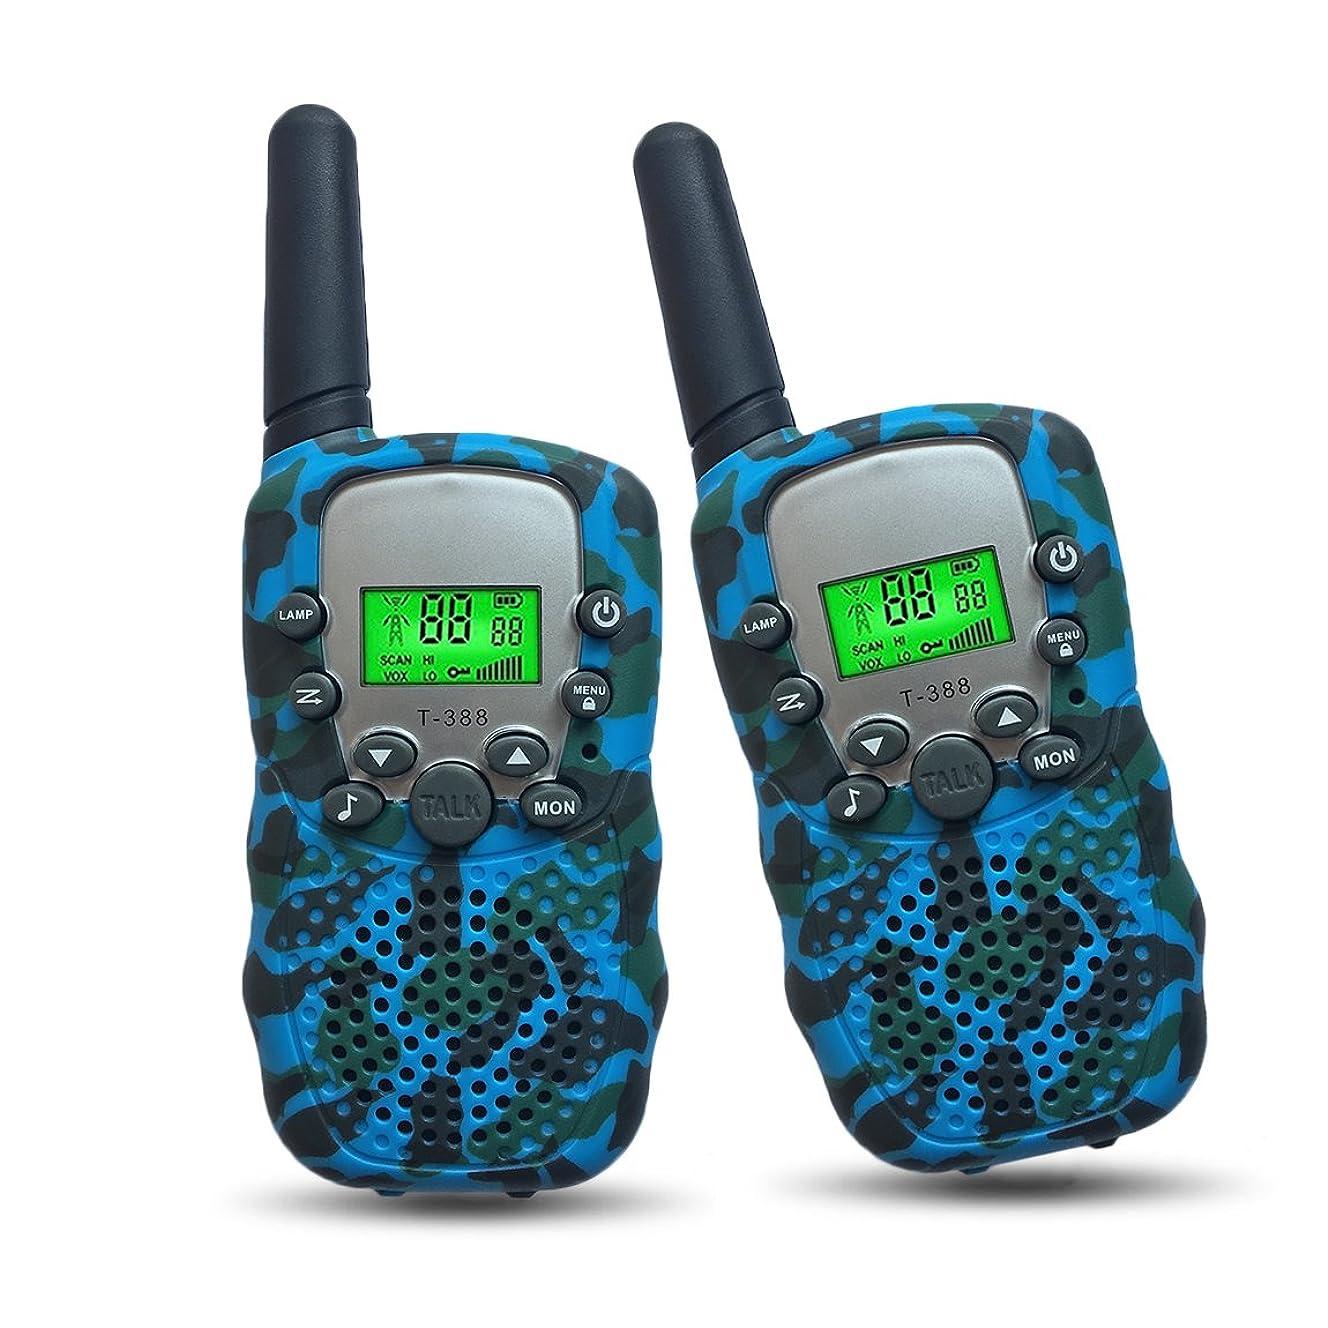 Joyfun Walkie Talkies for Kids T-388 Long Distance 2 Way with Flashlight Outdoor Camping & Hiking Gear - 1 Pair